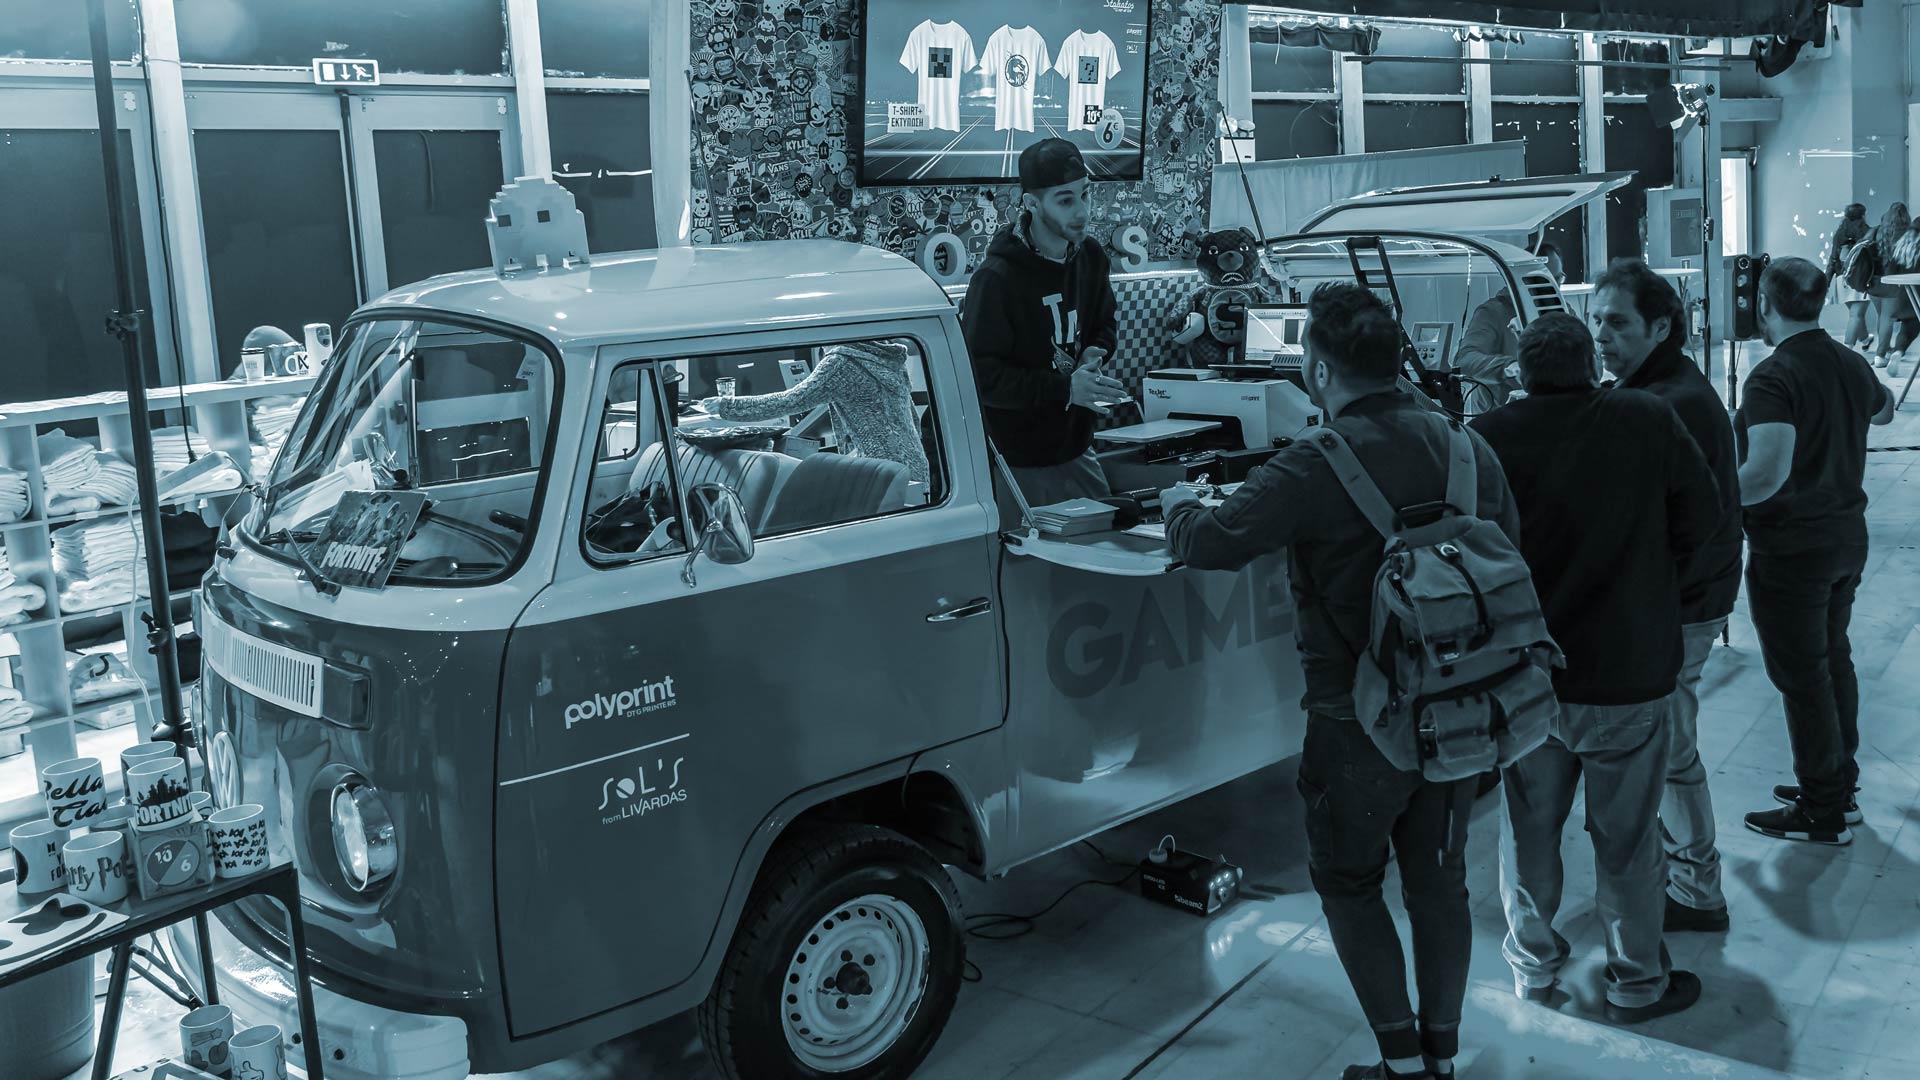 Blue tinted image of Texjet Shortee2 Printer on mini-van at event